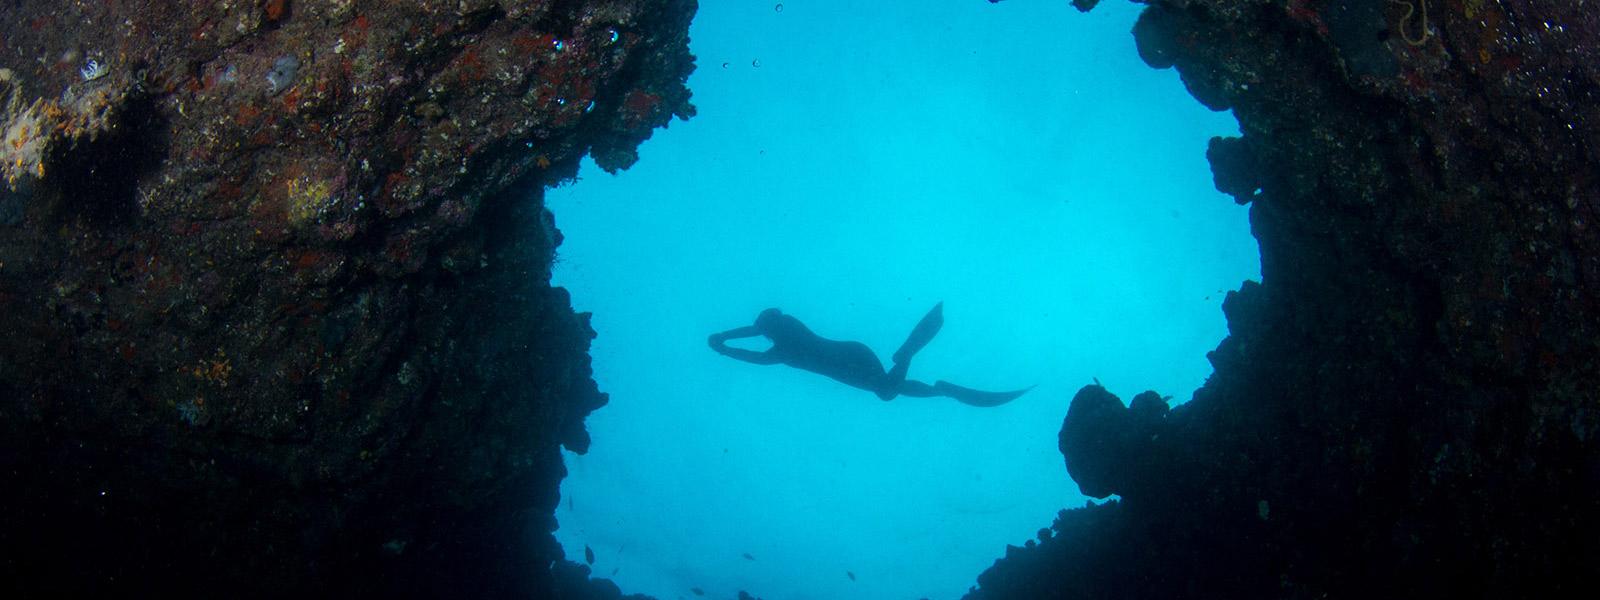 Maldives Freediving Apnea